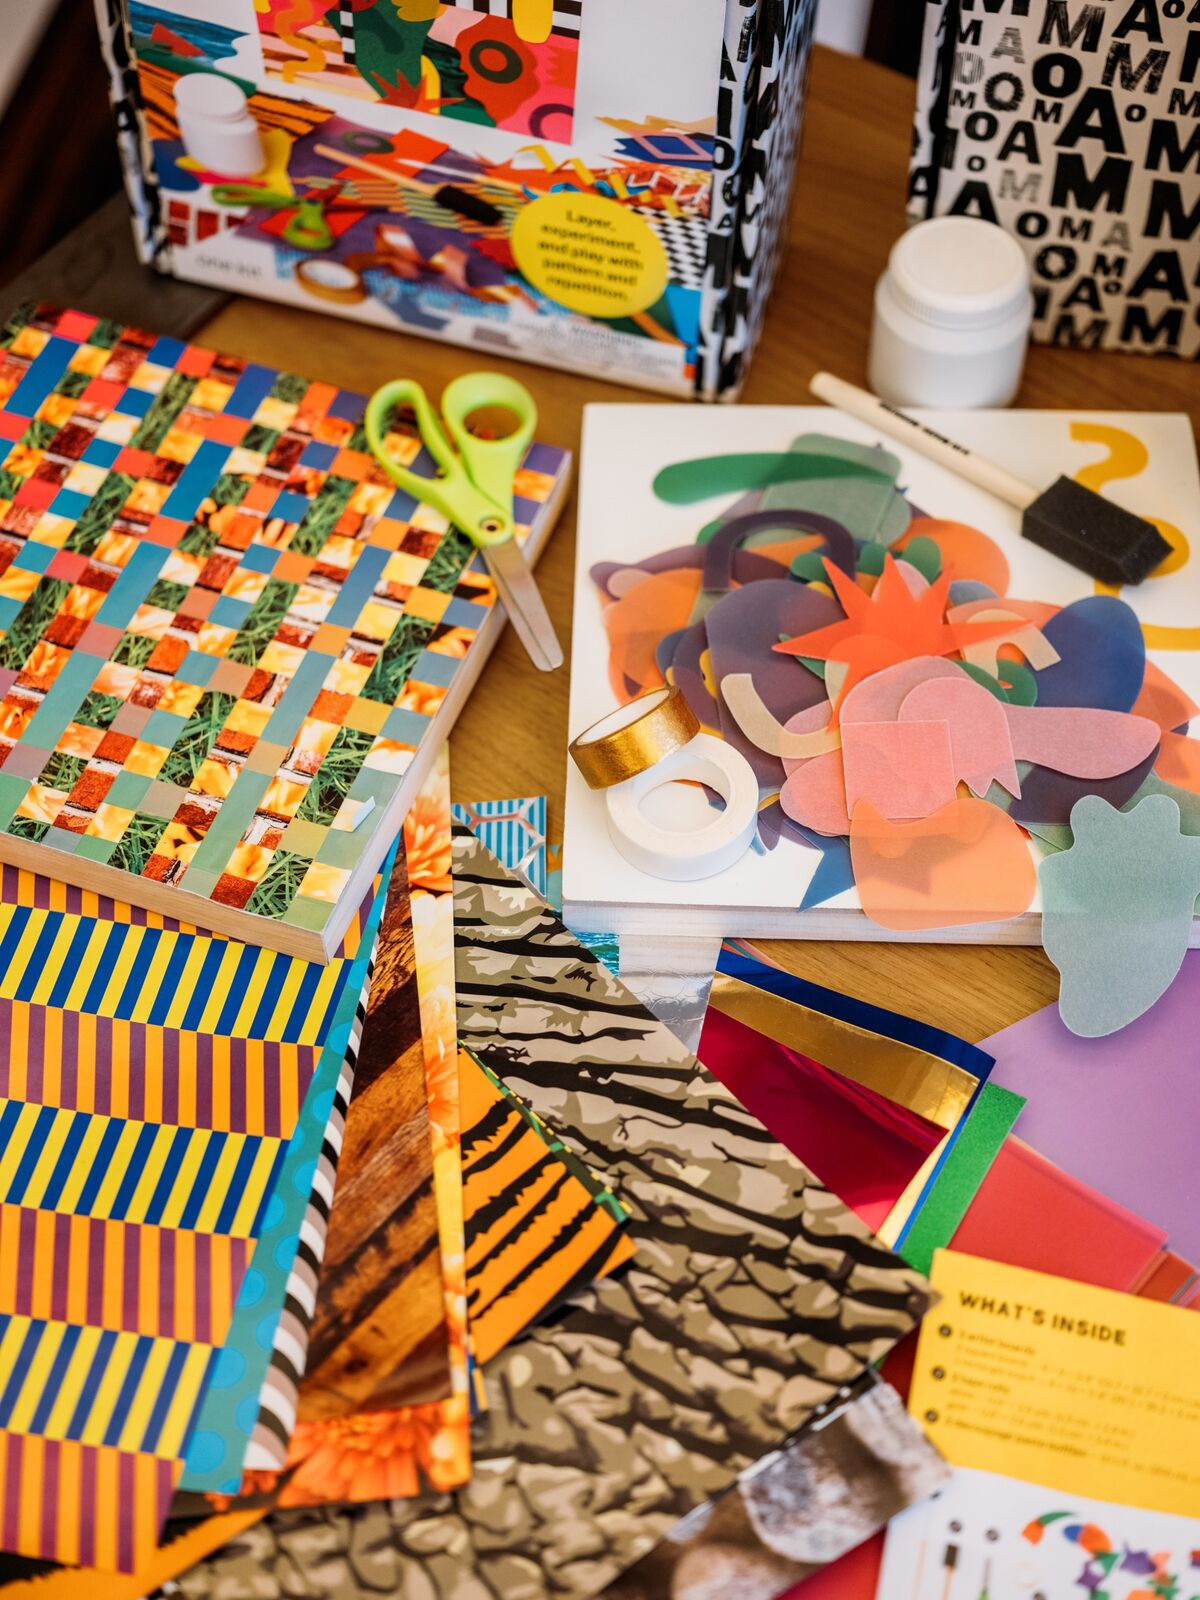 Making with MoMA's art kit. Courtesy of MoMA.